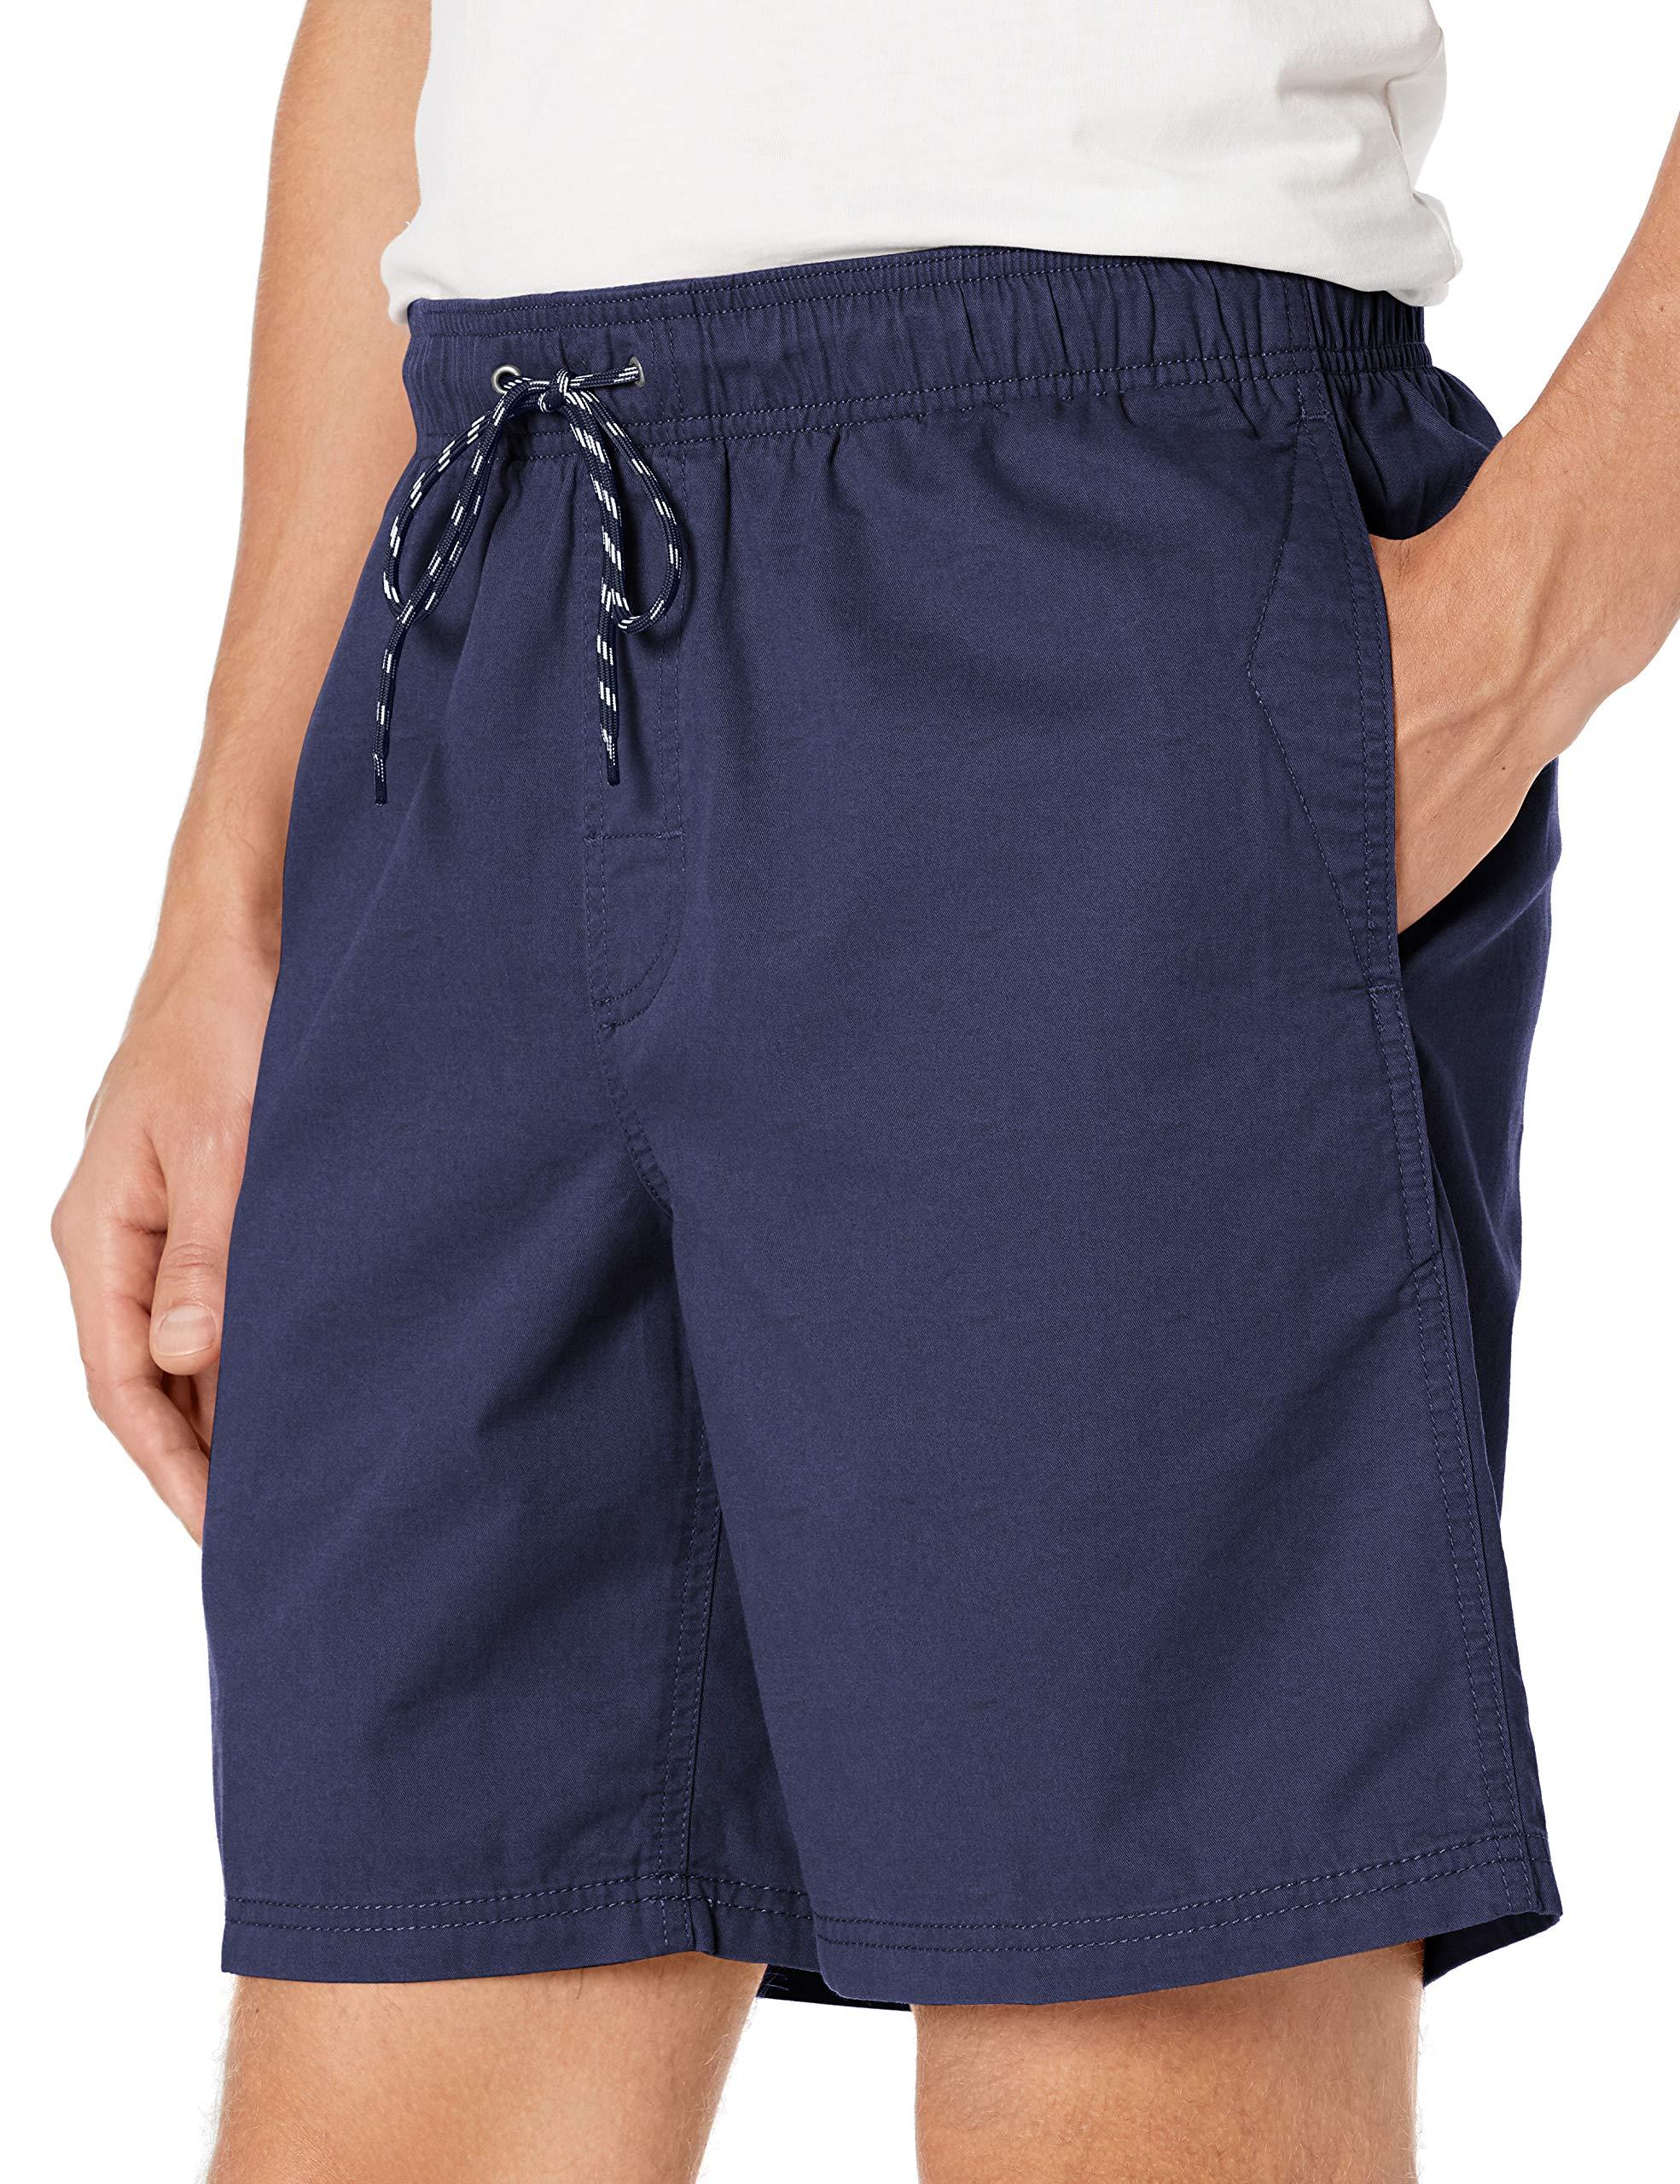 Amazon Essentials Men's Drawstring Walk Short